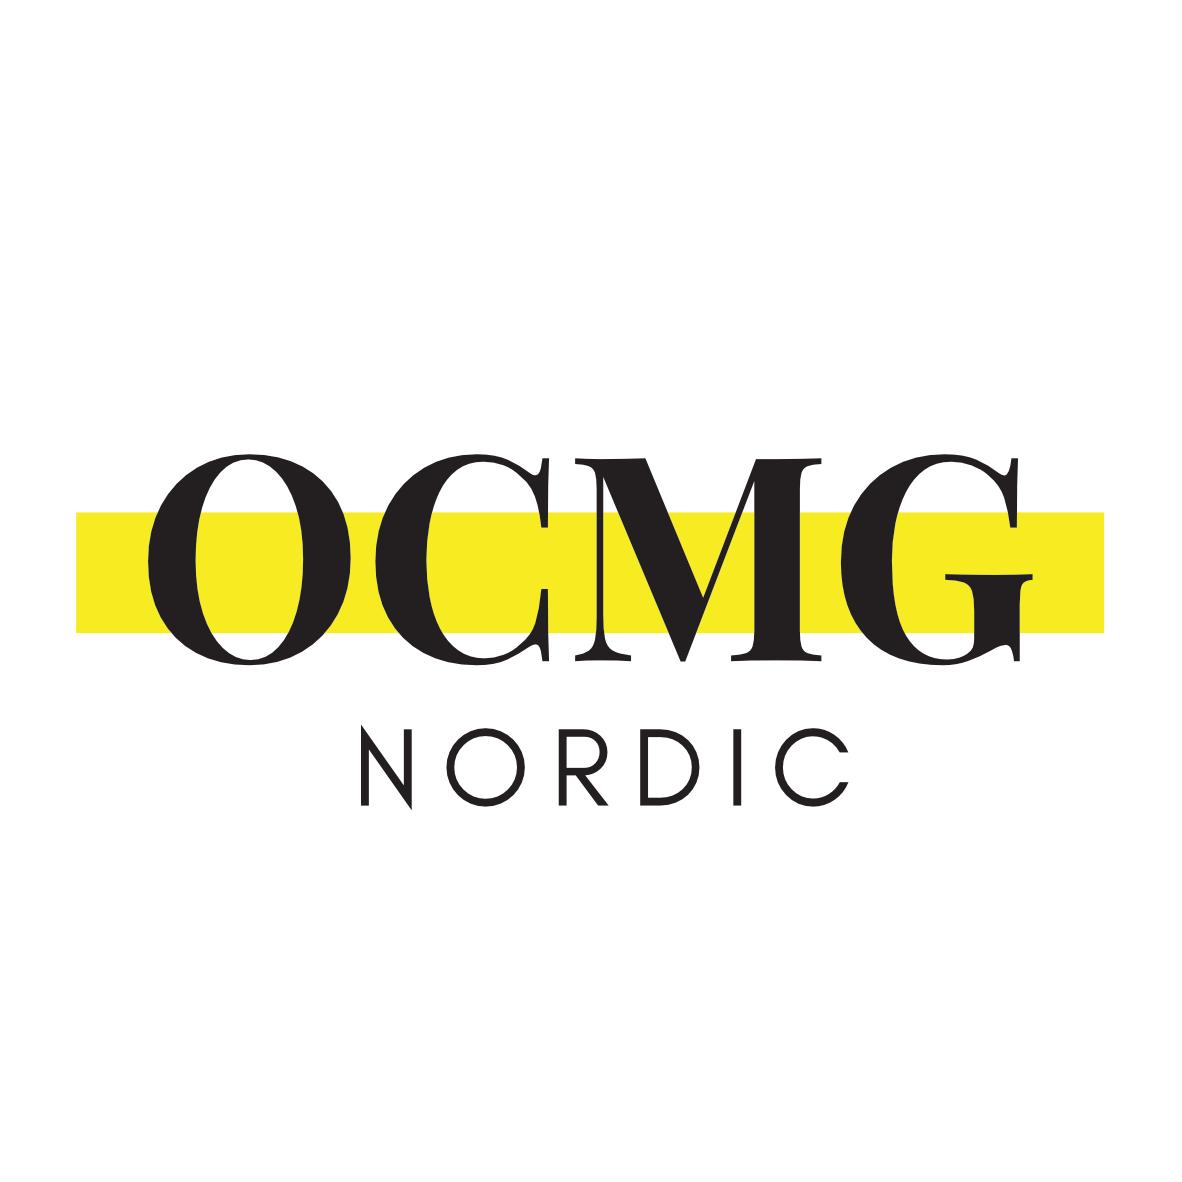 OCMGnordic_logo